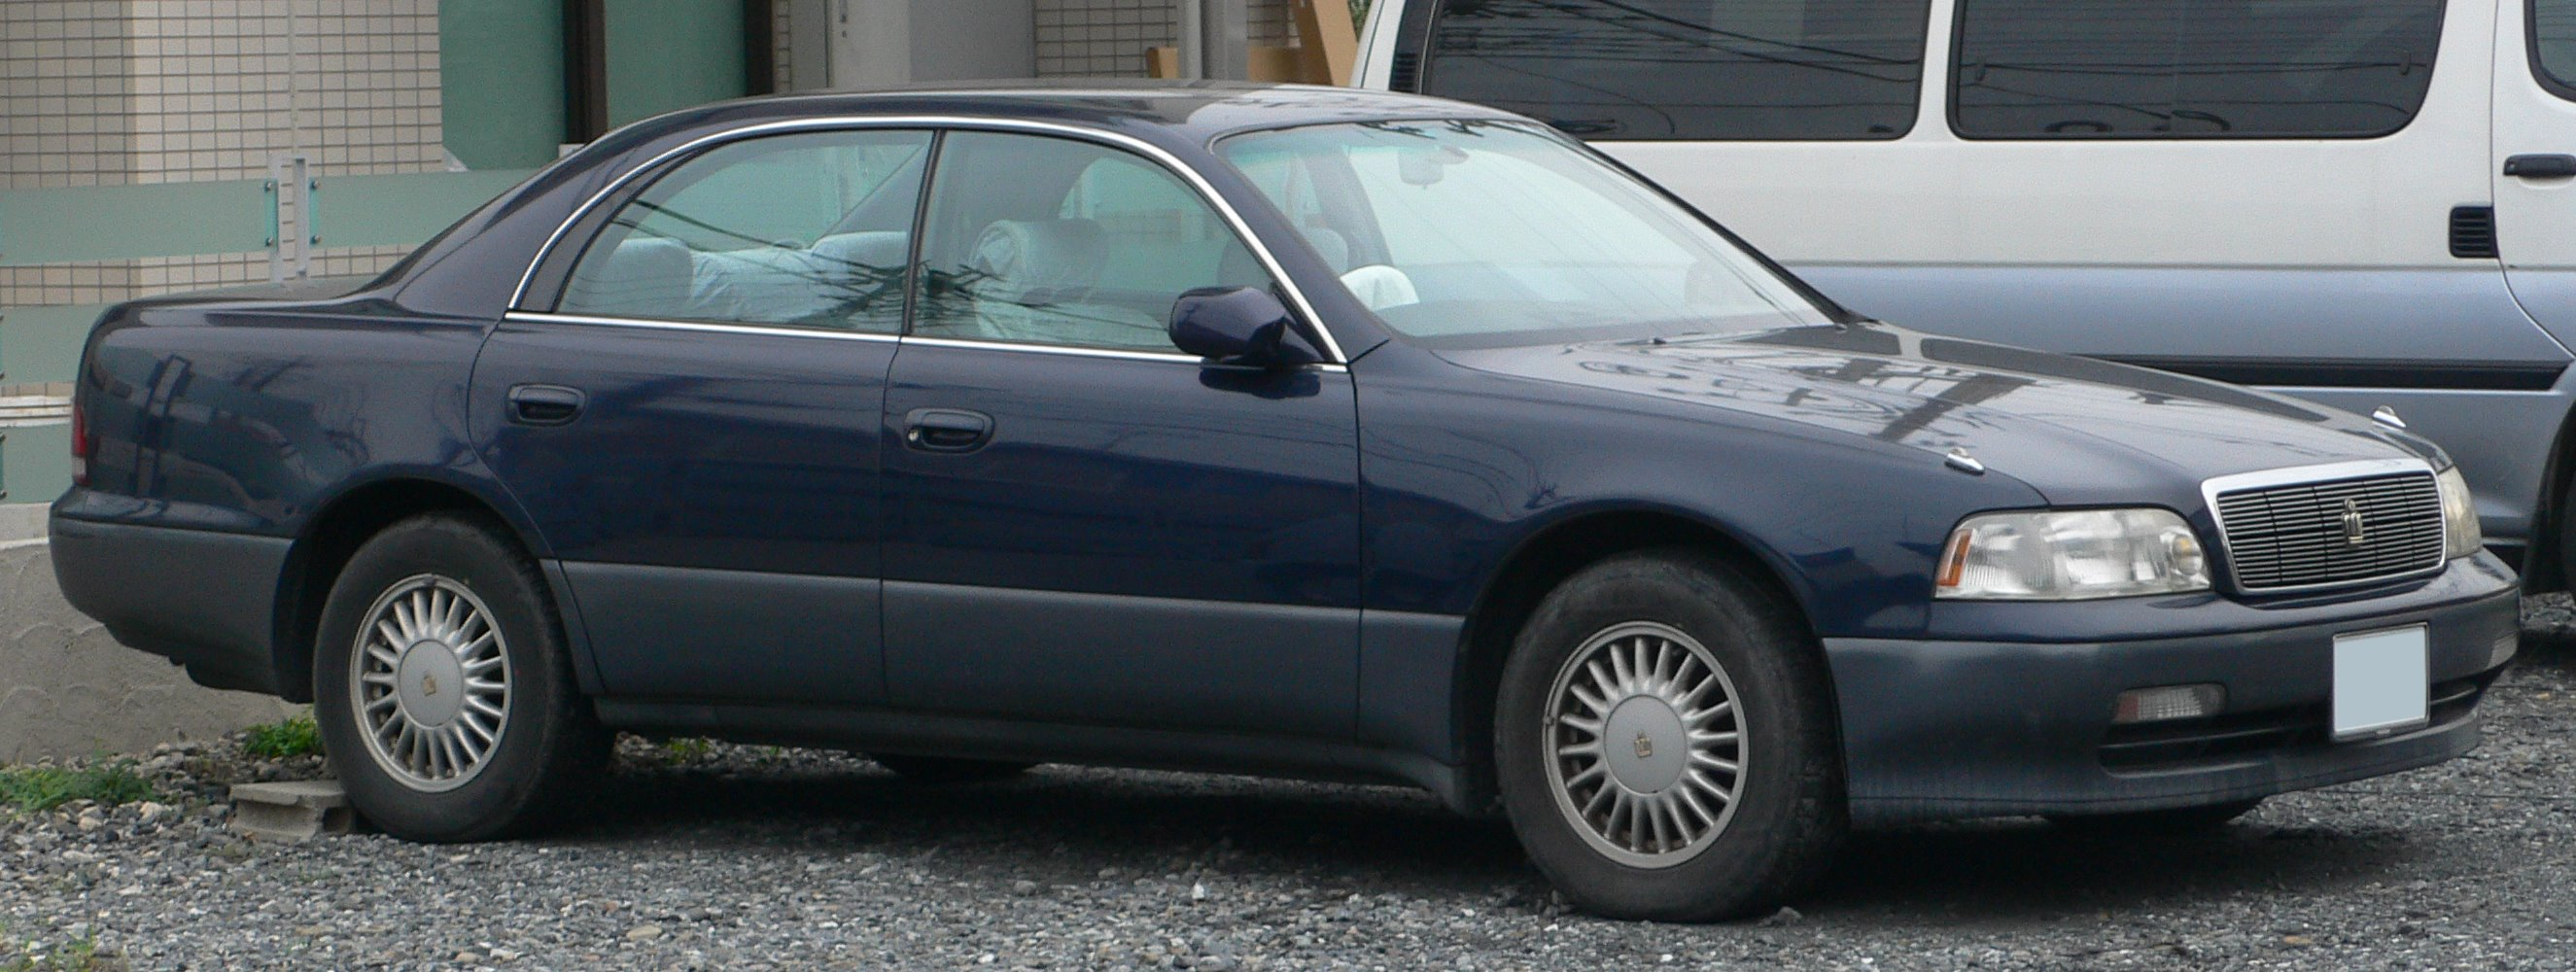 Description 1991 Toyota Crown-Majesta 01.jpg